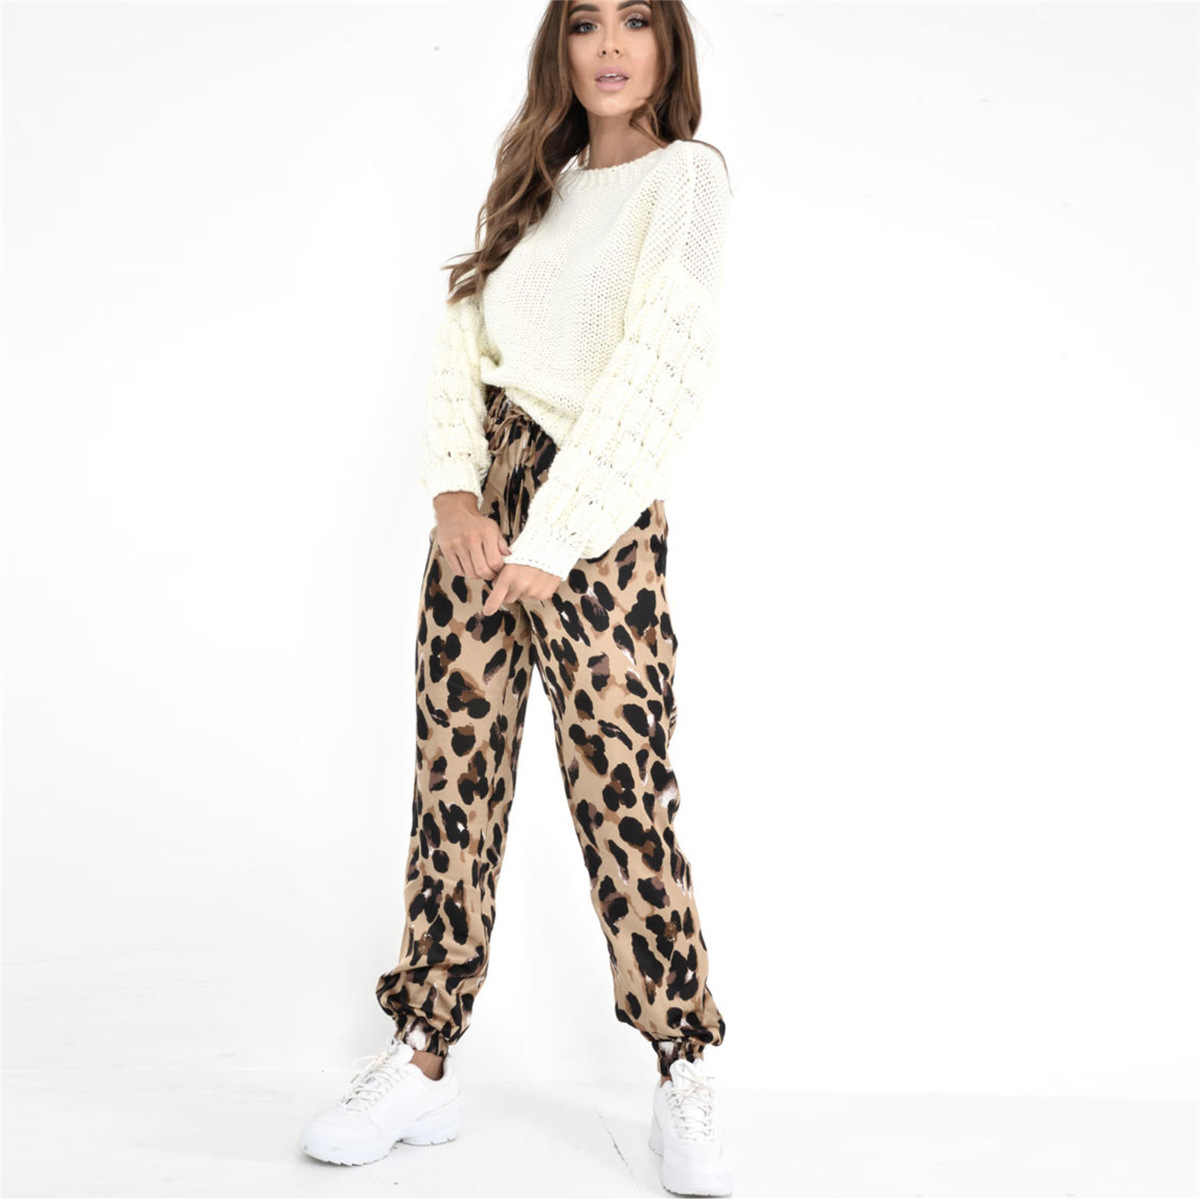 ae637ec47194 ... Satin Silk Leopard Print High Waist Bloom Pants Women Loose Casual  Trousers Fashion Animal Print Bottoms ...